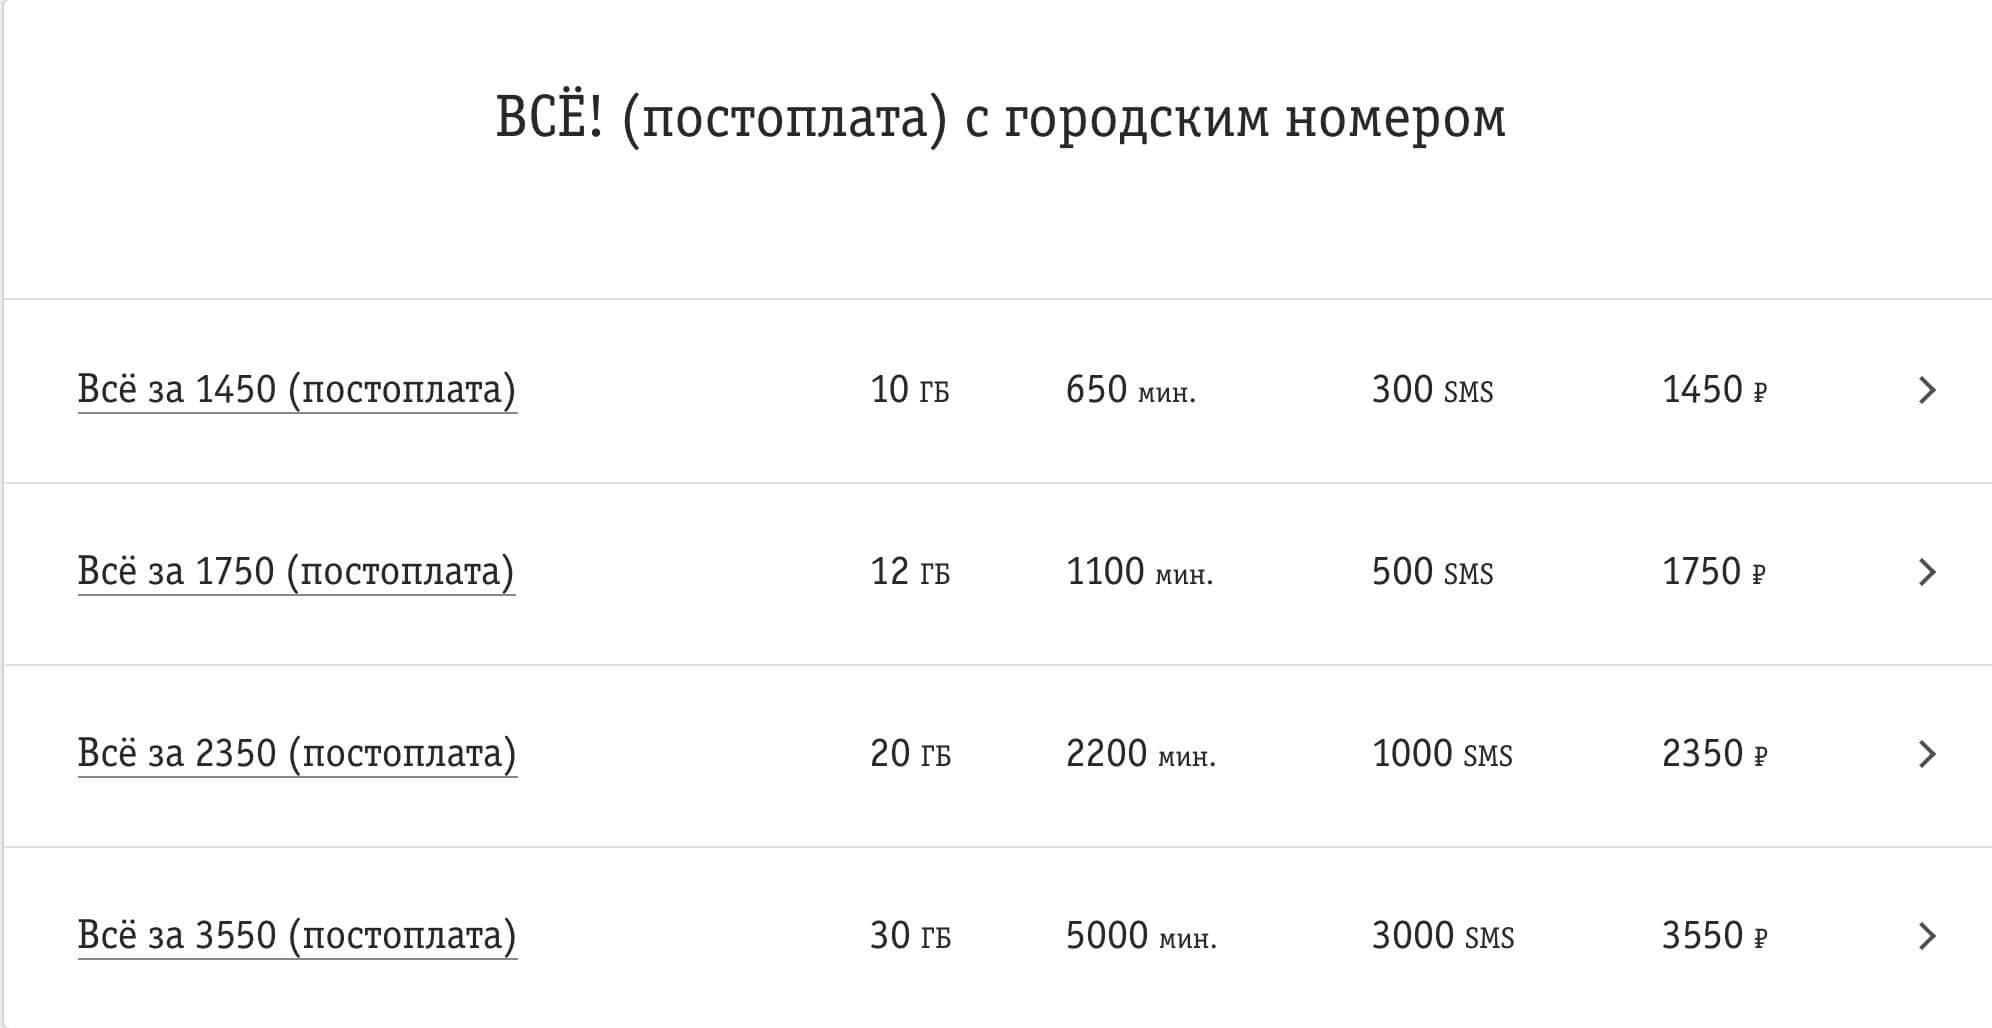 тарифы сотовой связи билайн москва